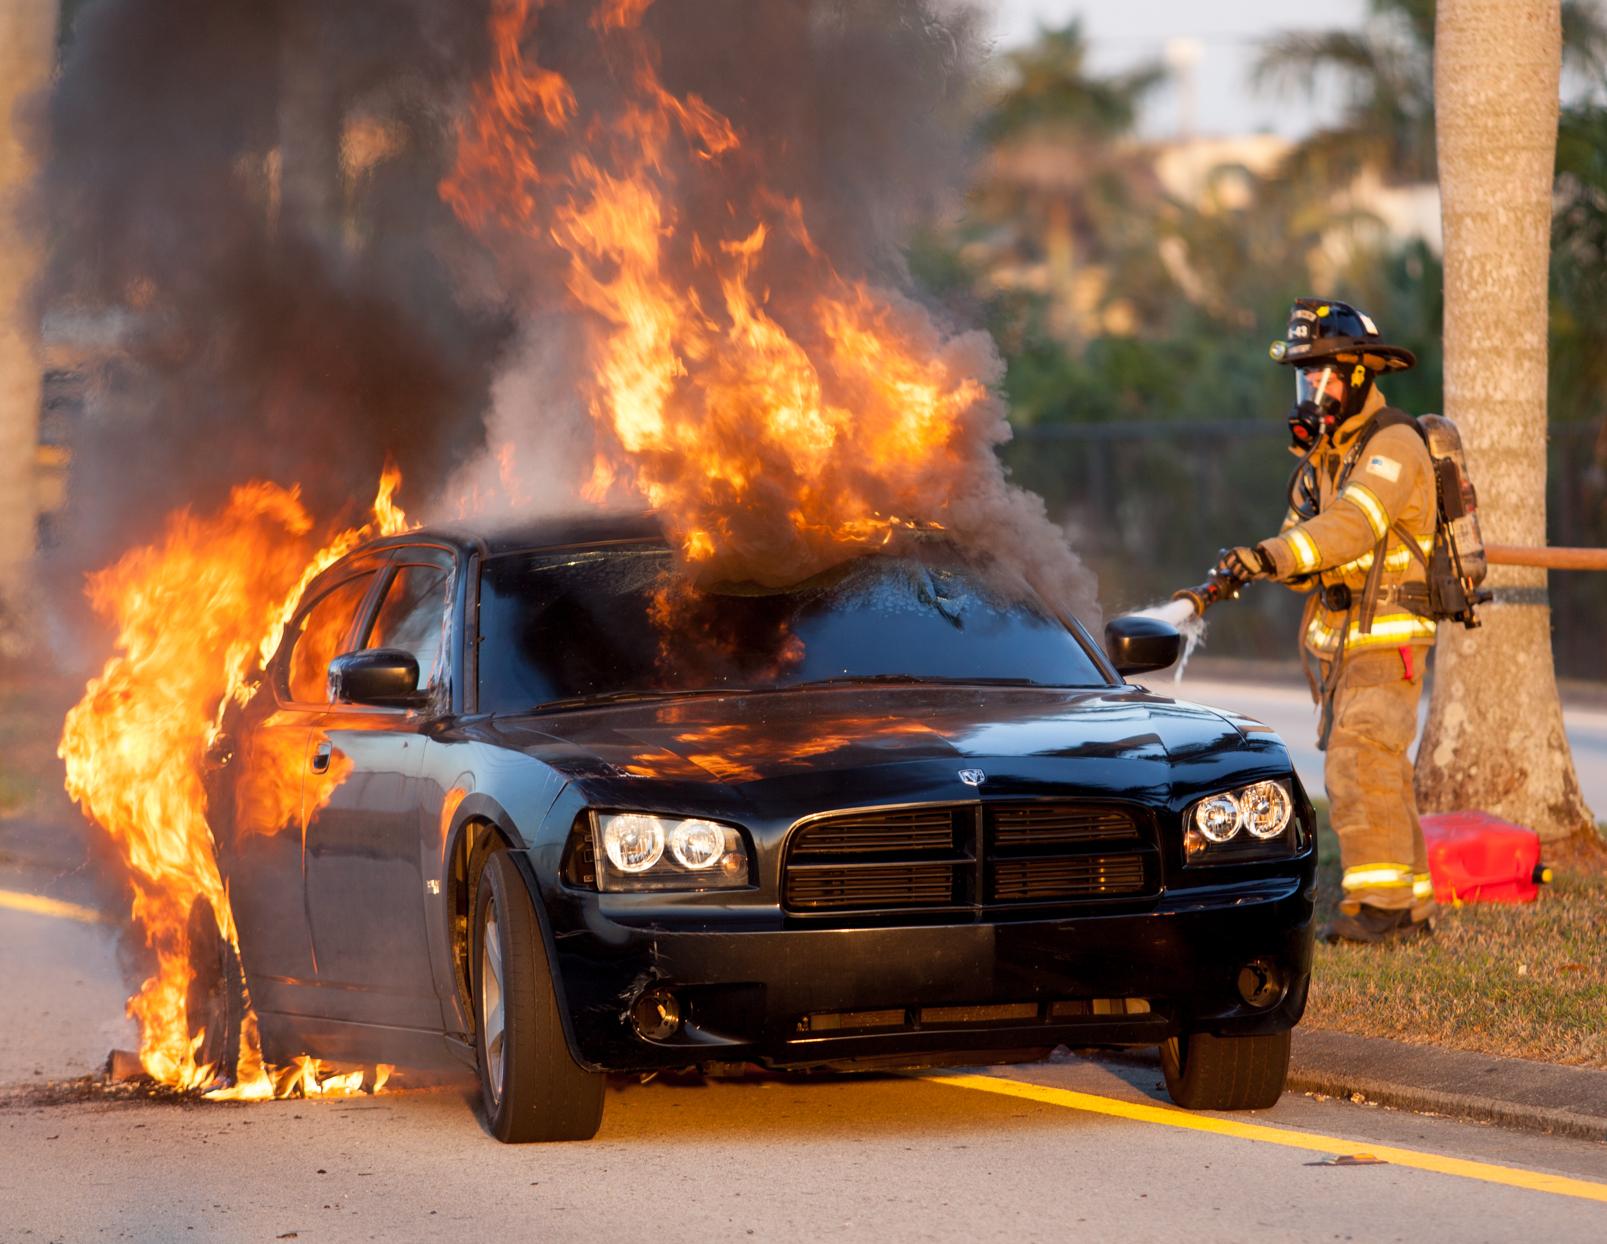 Explosion & Burn Injuries